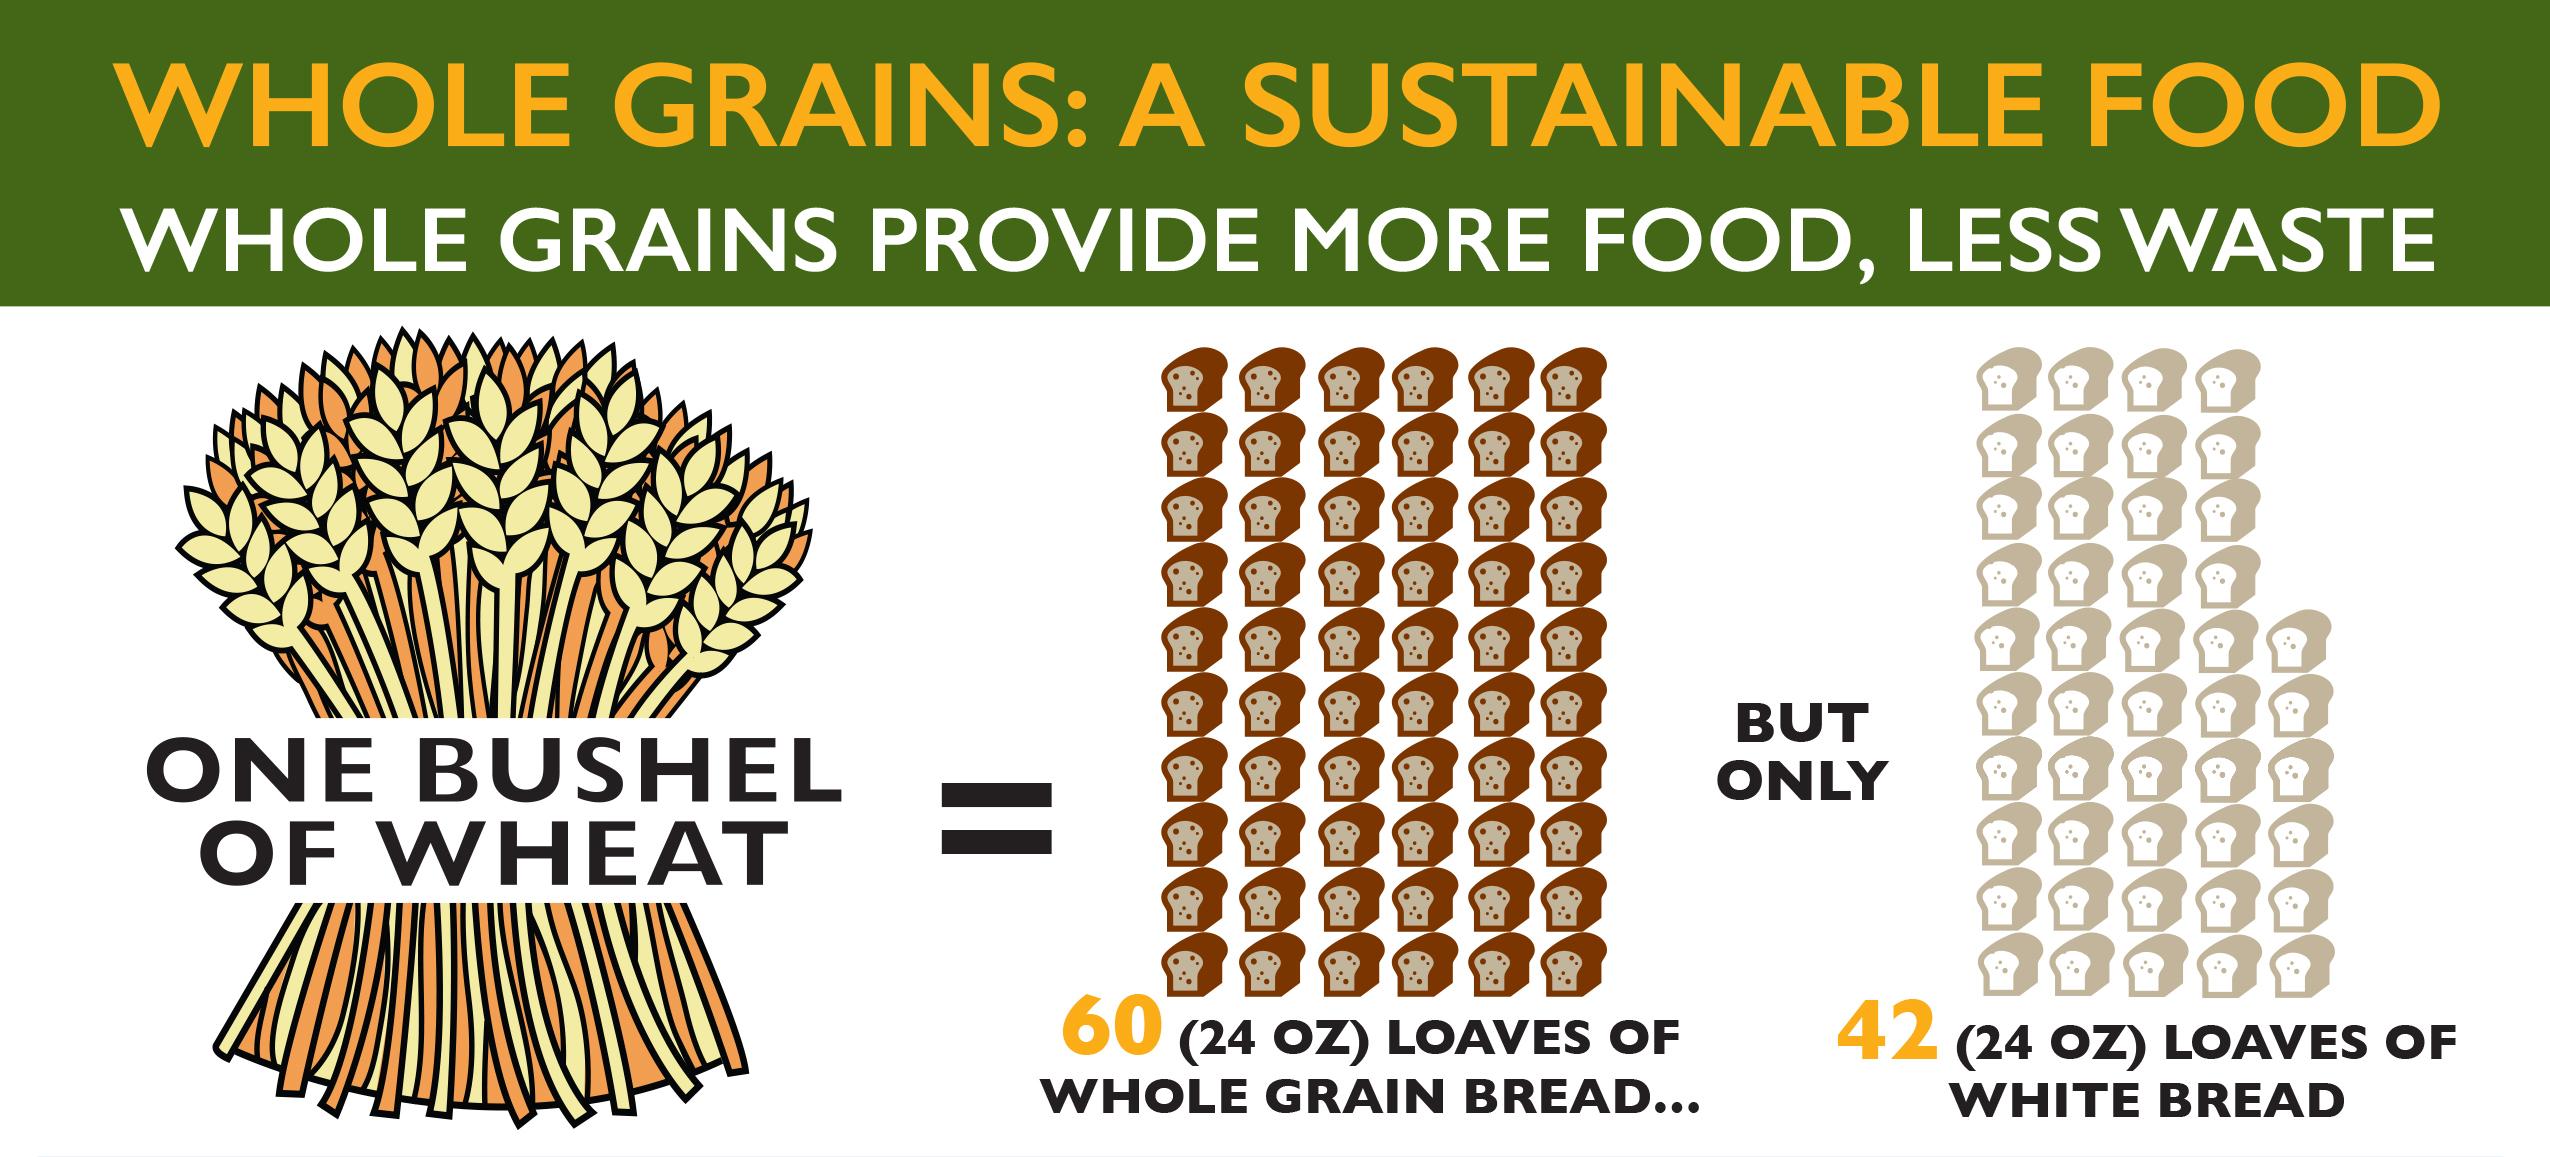 WG_SustainableFood_infographic-1.jpg